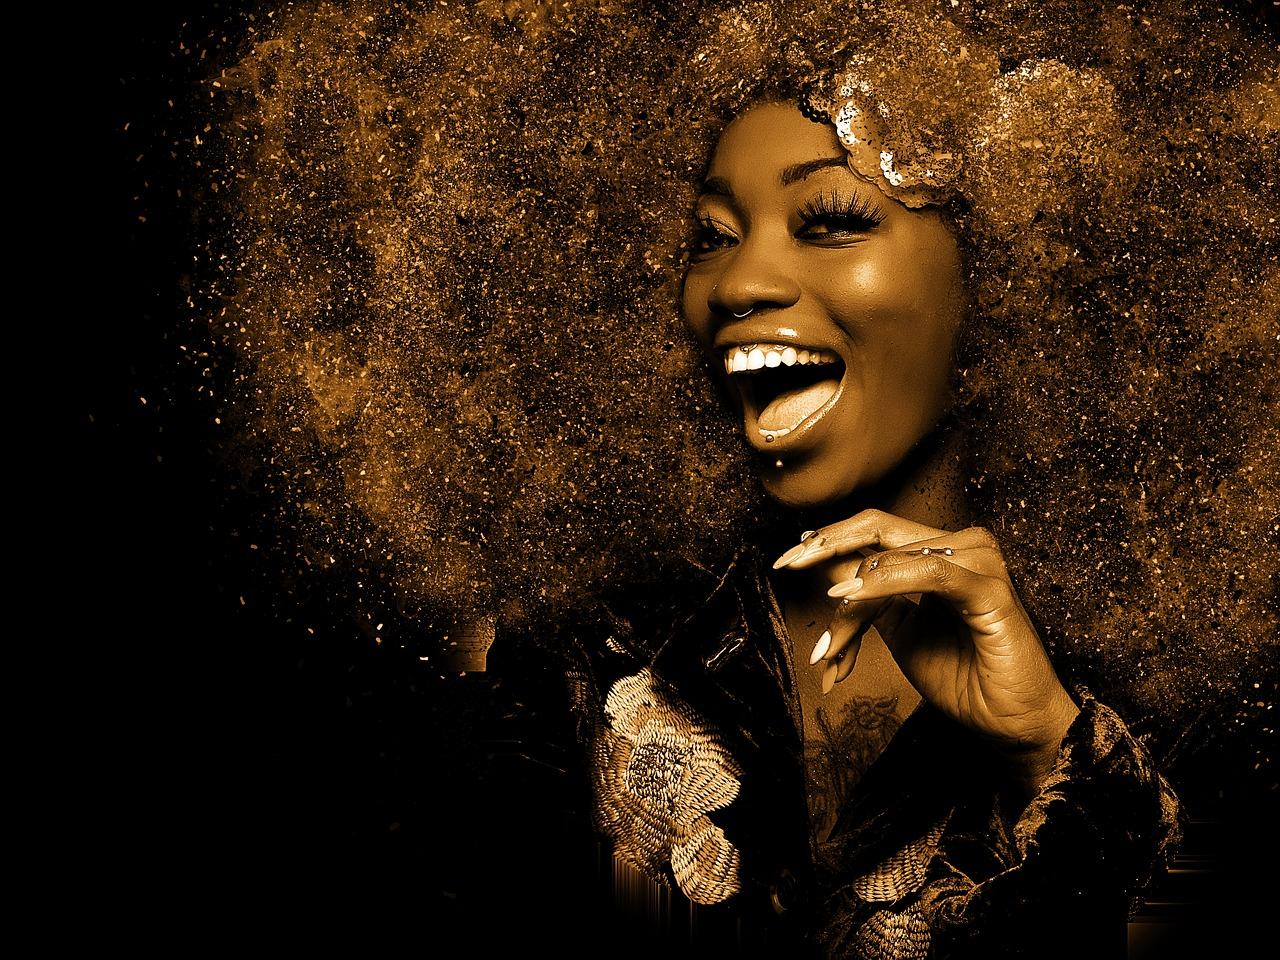 Femme noire blackisreallybeautiful